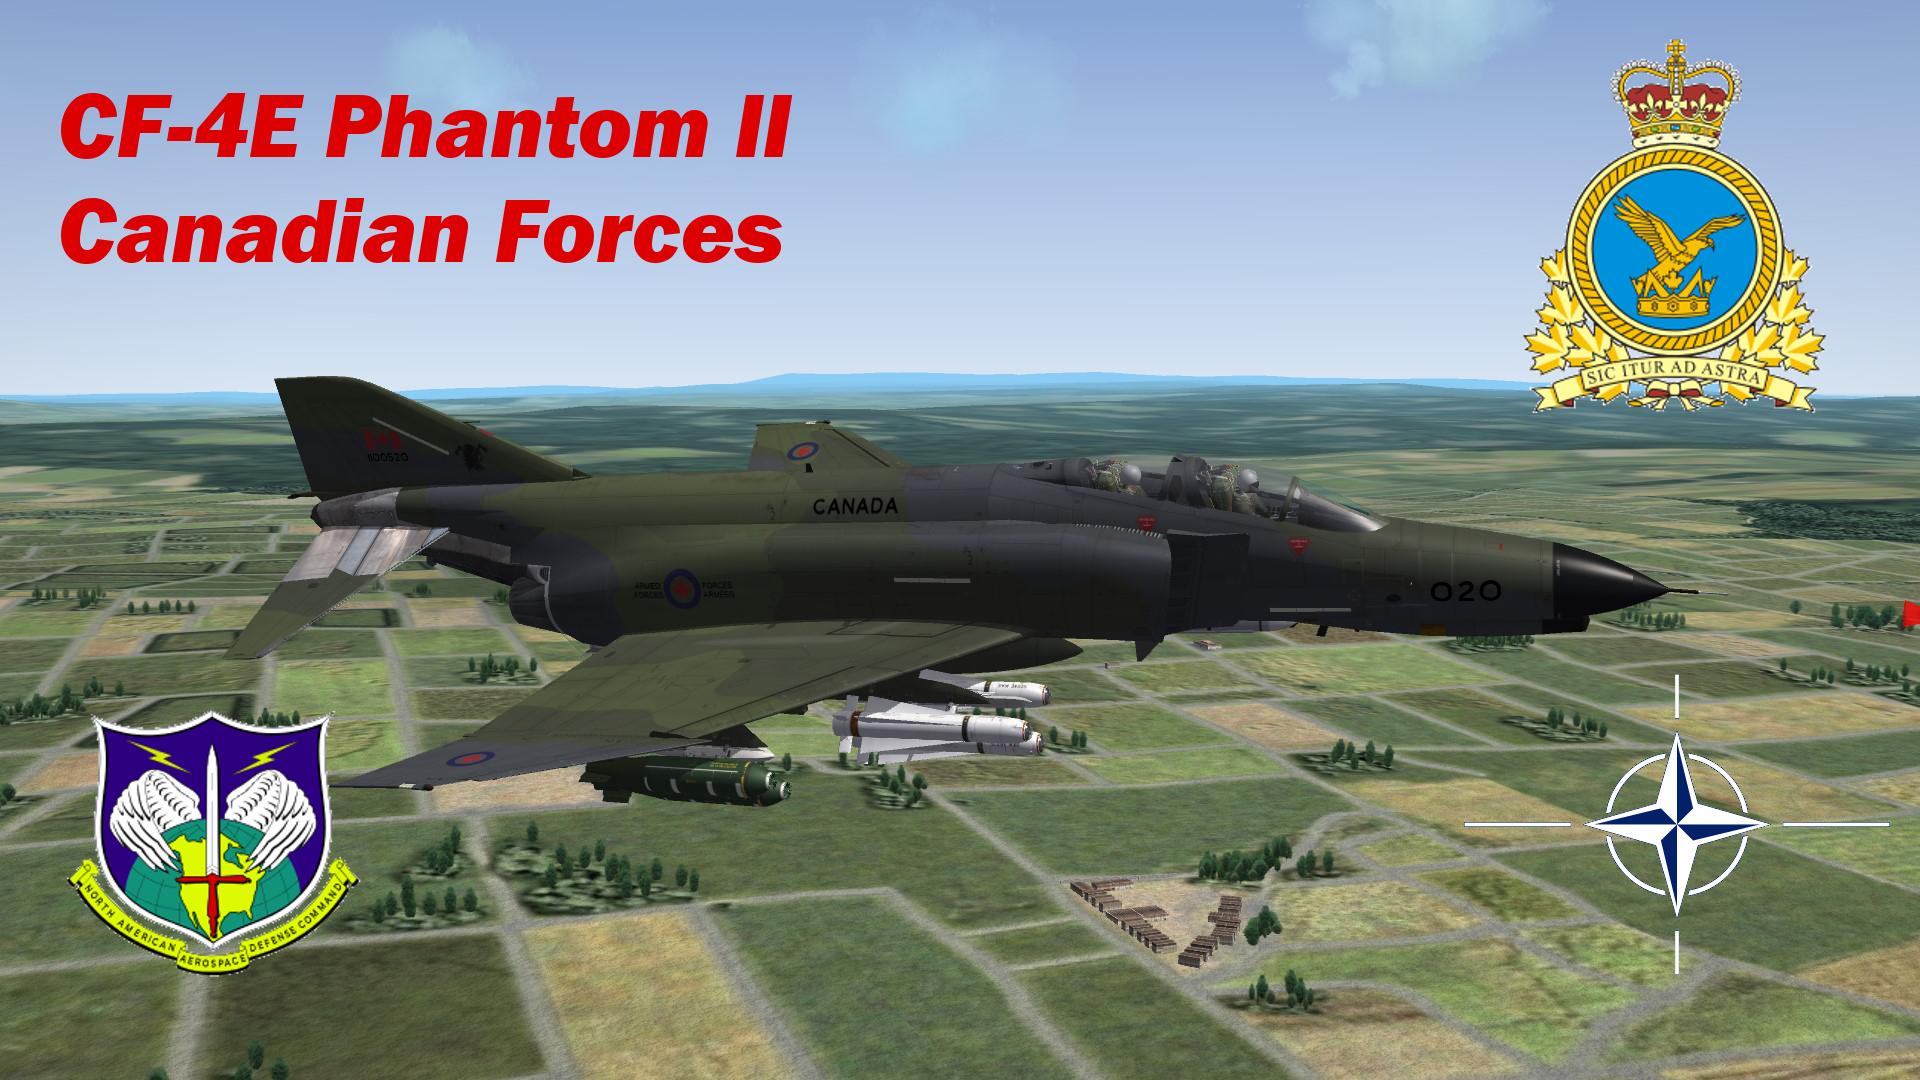 CF-4E Phantom II - Canadian Forces - Part 2